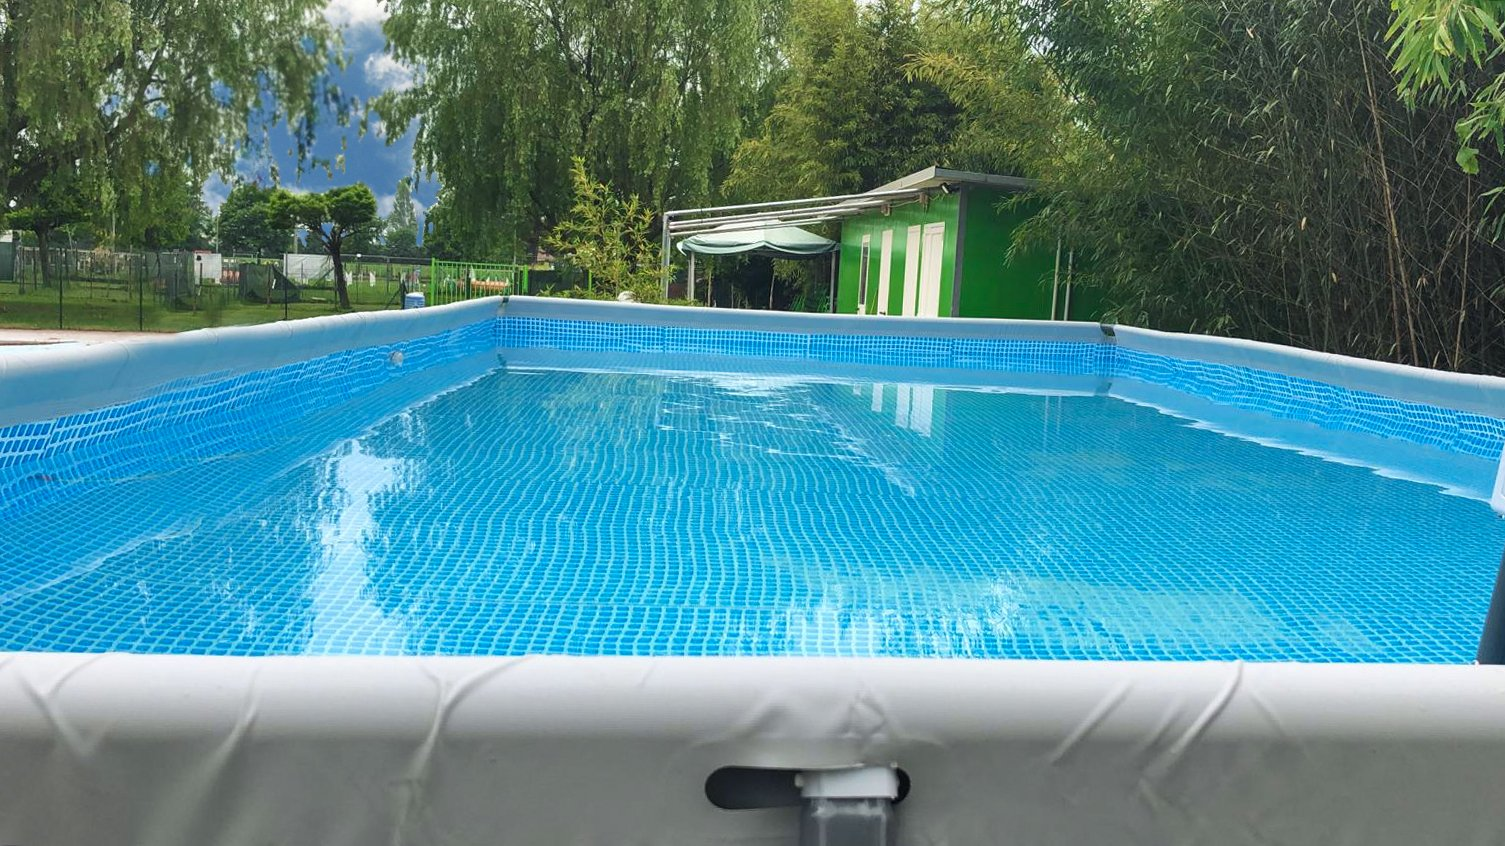 Massafra, bimbo di 20 mesi muore dopo essere caduto in una piscina